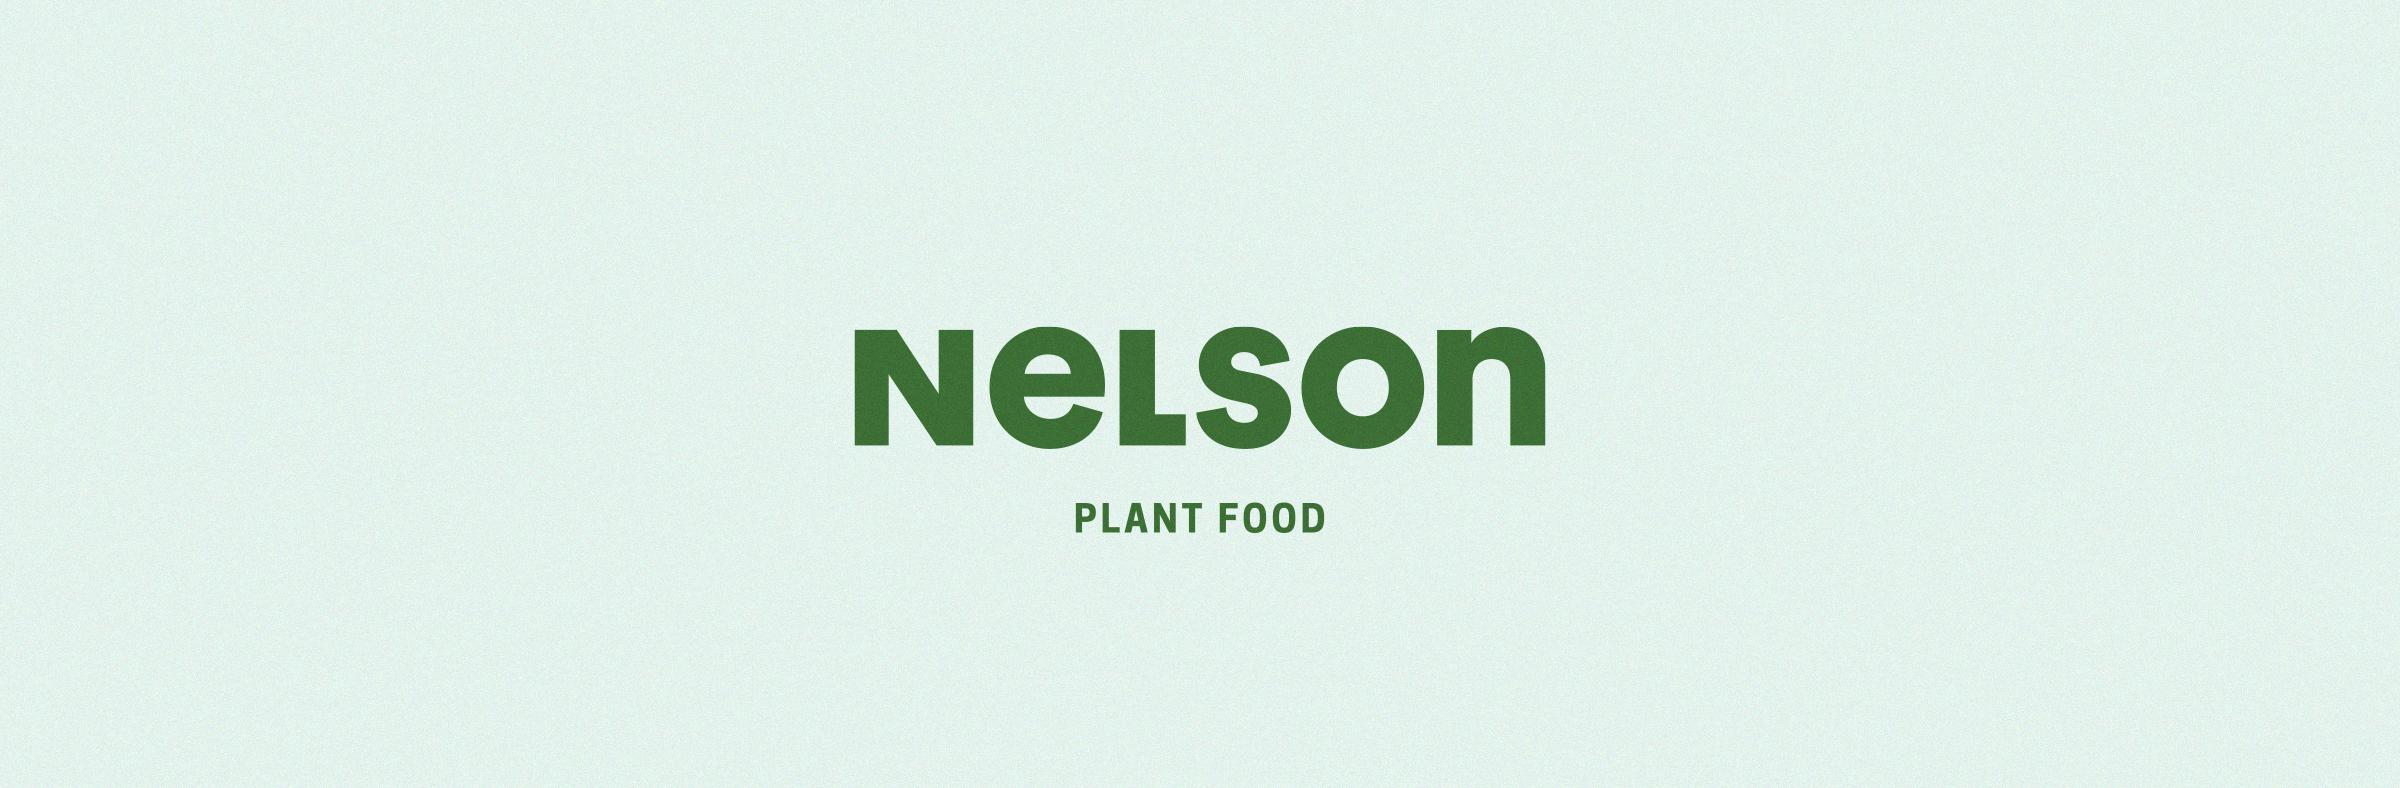 Nelson Plant Food logo lockup green on blue